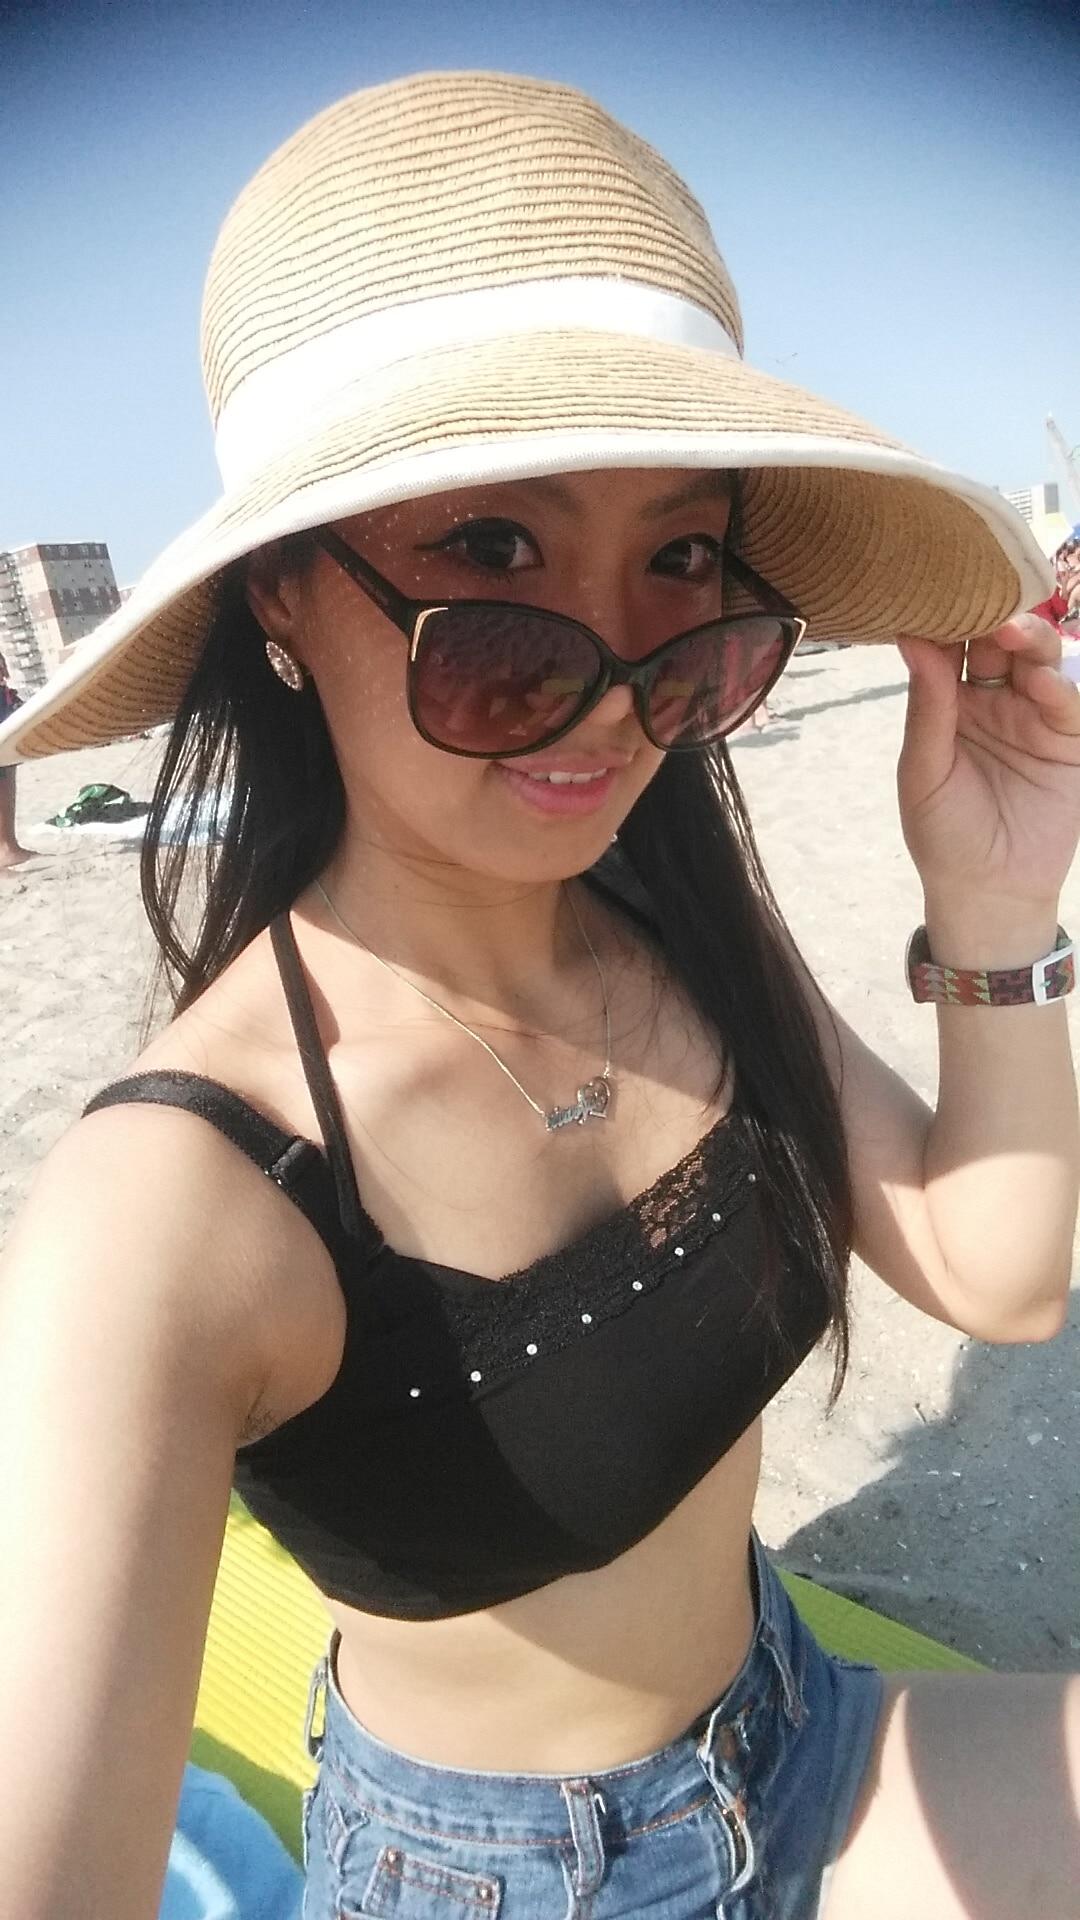 I am xiaoyan originally from north part of China.